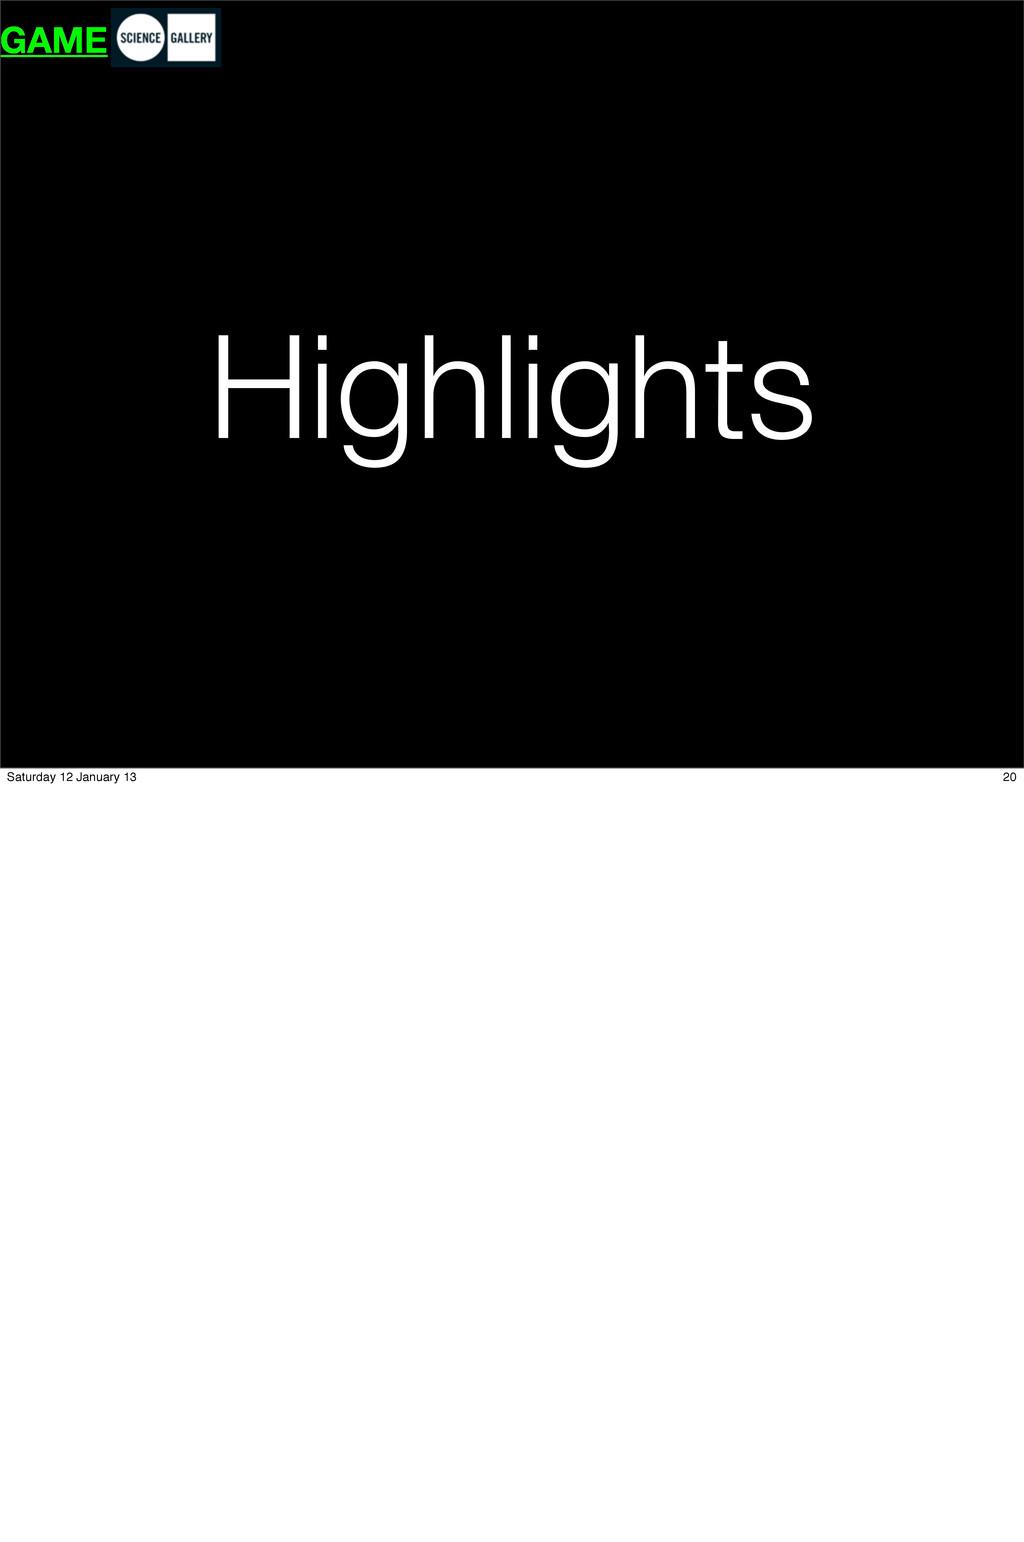 Highlights GAME 20 Saturday 12 January 13